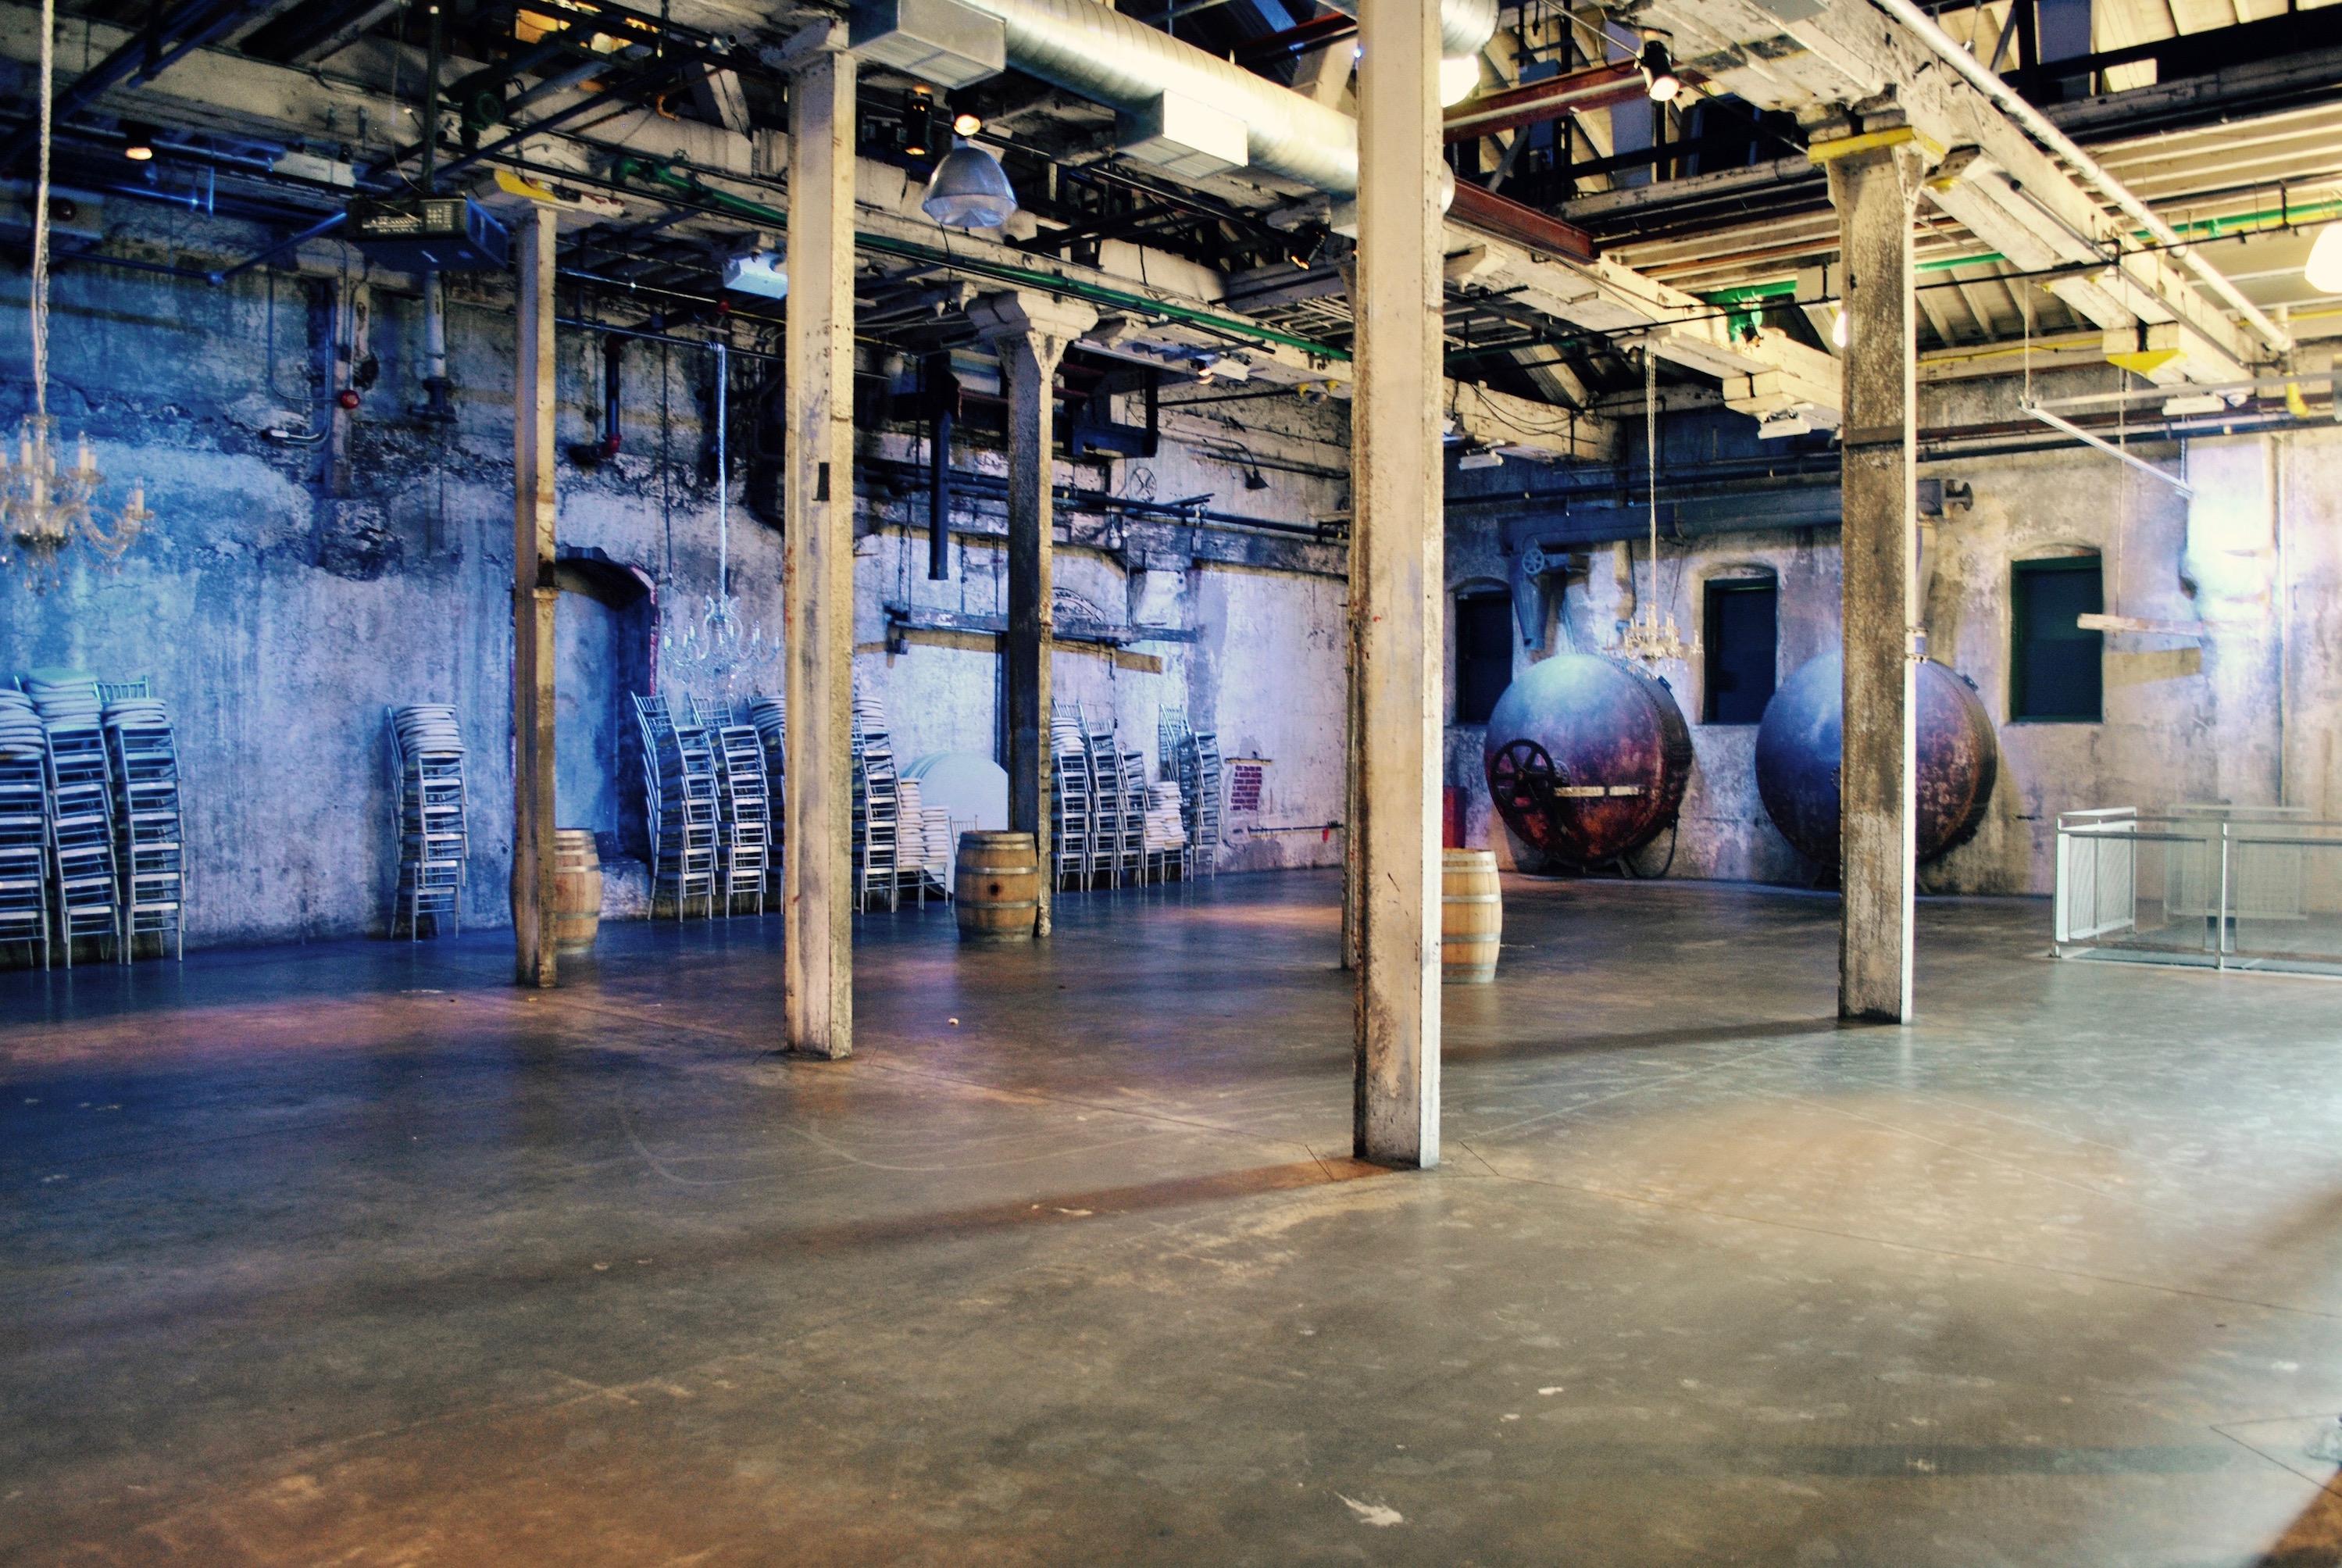 Toronto Event Venues The Fermenting Cellar Reynold Lobo. SaveEnlarge · Distillery District ... & Fermenting Cellar Distillery District - Natashamillerweb